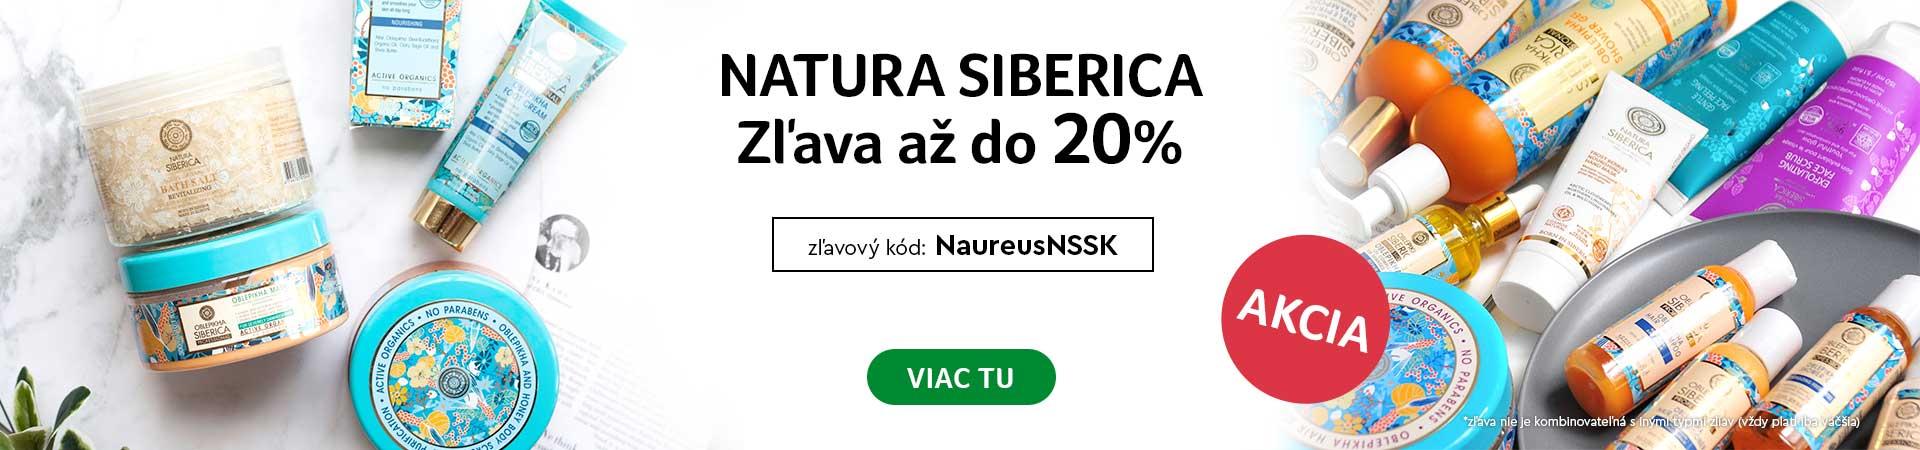 bf_nautra_siberica